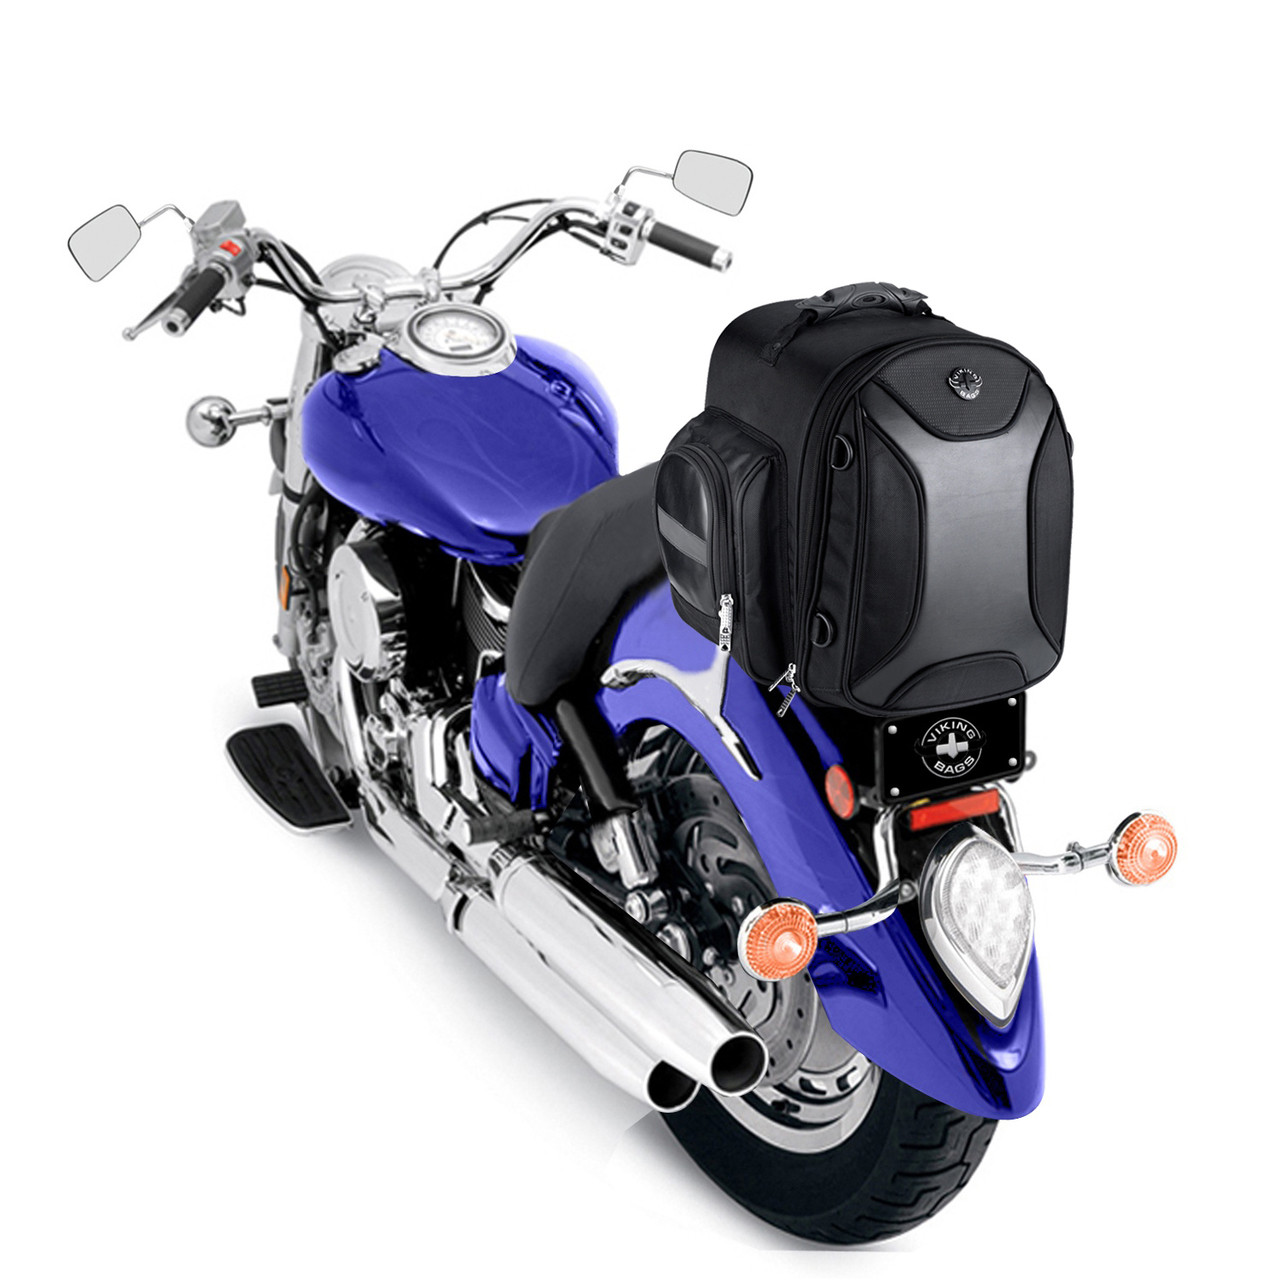 VikingBags Dagr Motorcycle Sissy Bar Bag on Bike View